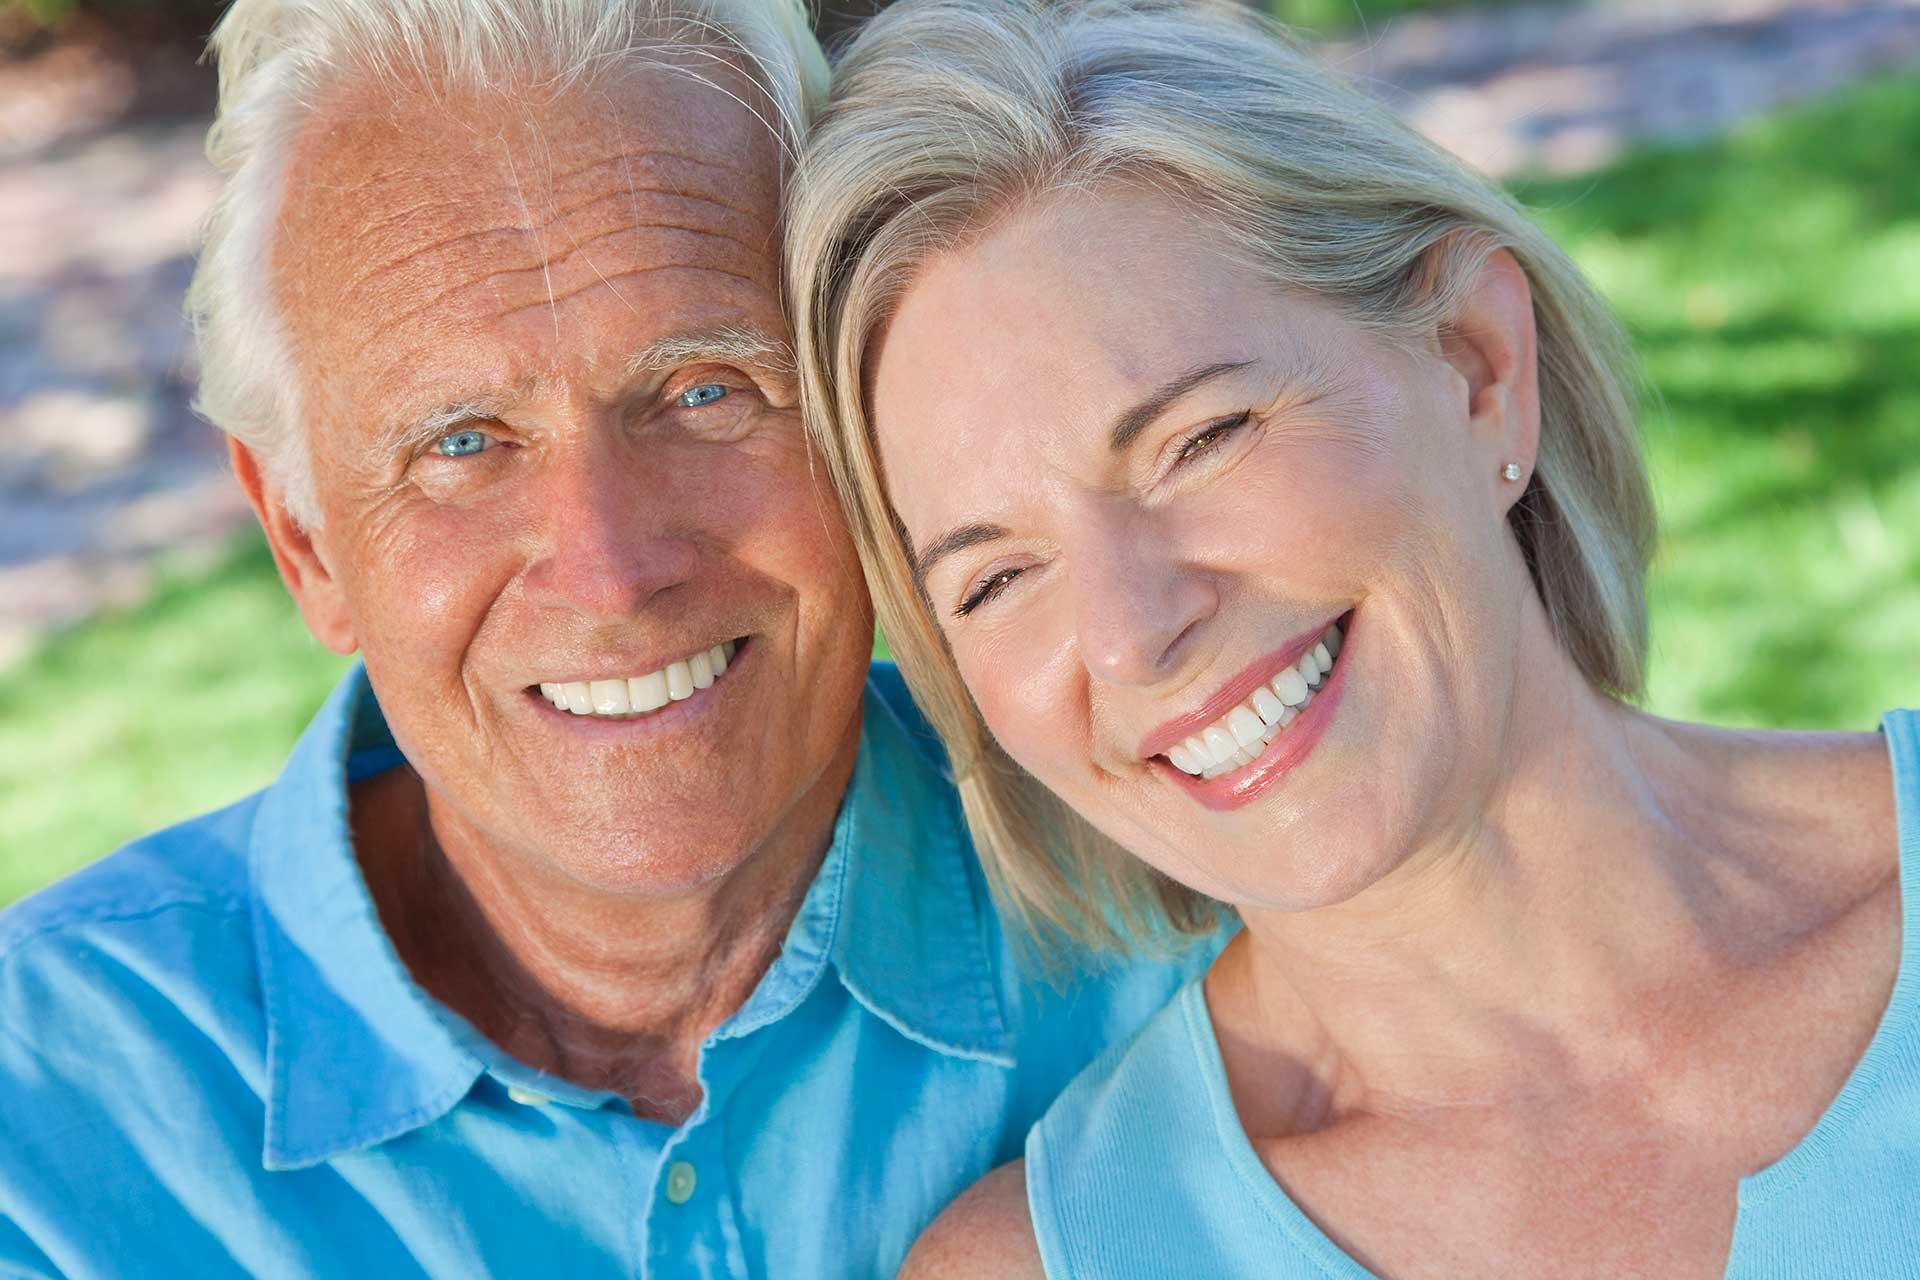 northwest houston teeth whitening patients